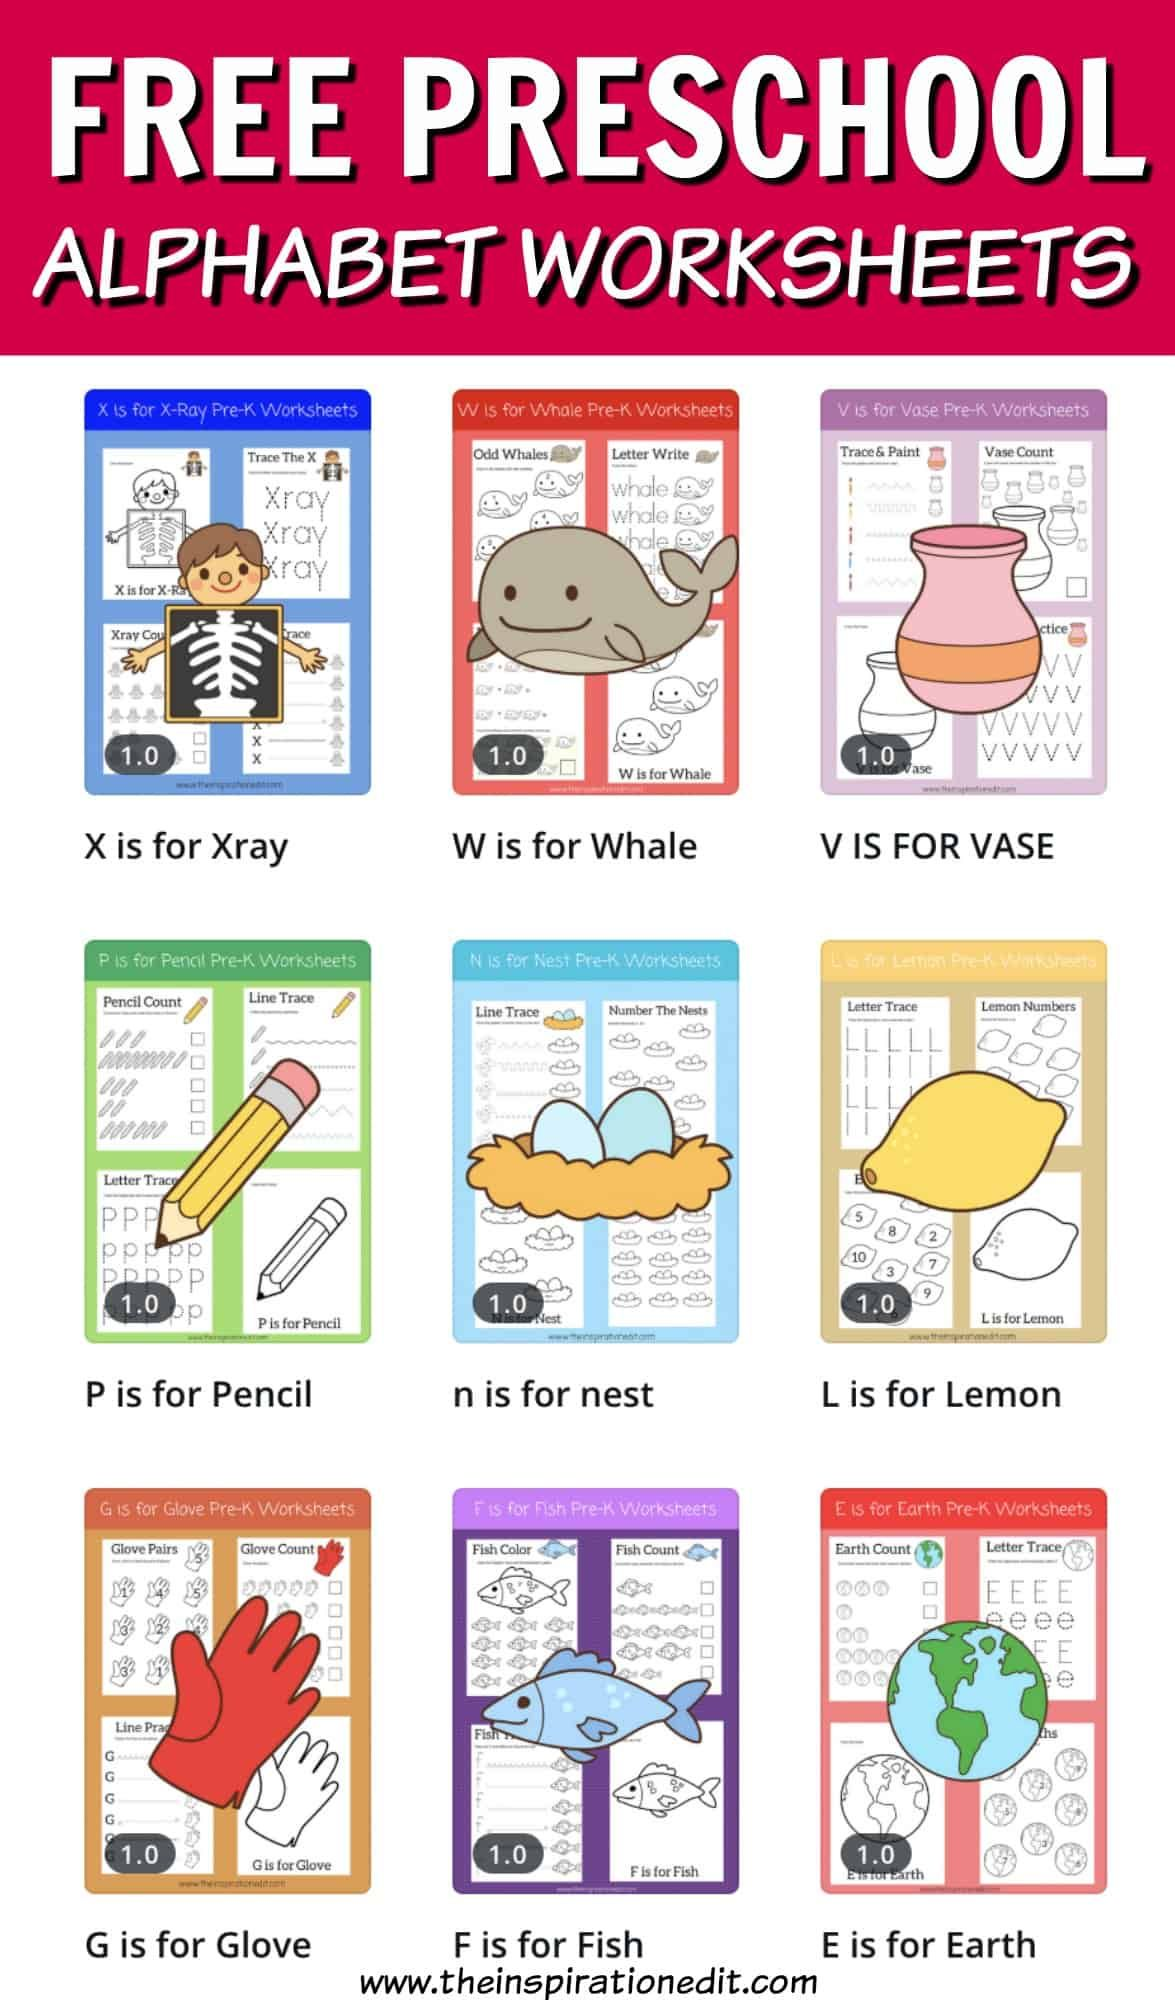 Letter R Worksheets For Preschool Kids